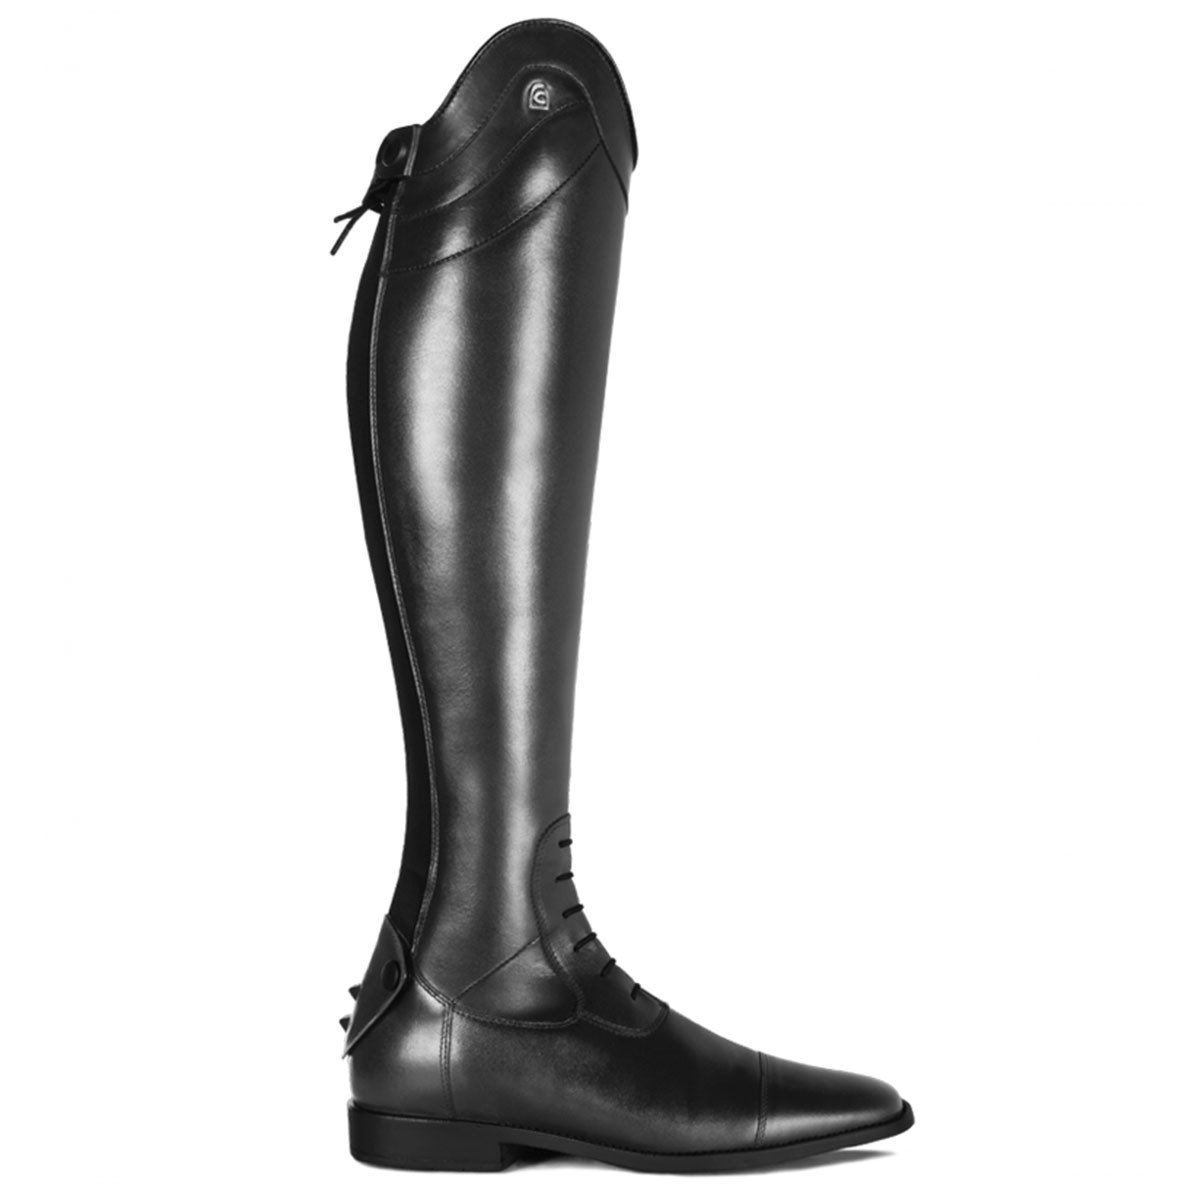 Cavallo Linus Slim rijlaars zwart maat:7-7.5 / h48-w33